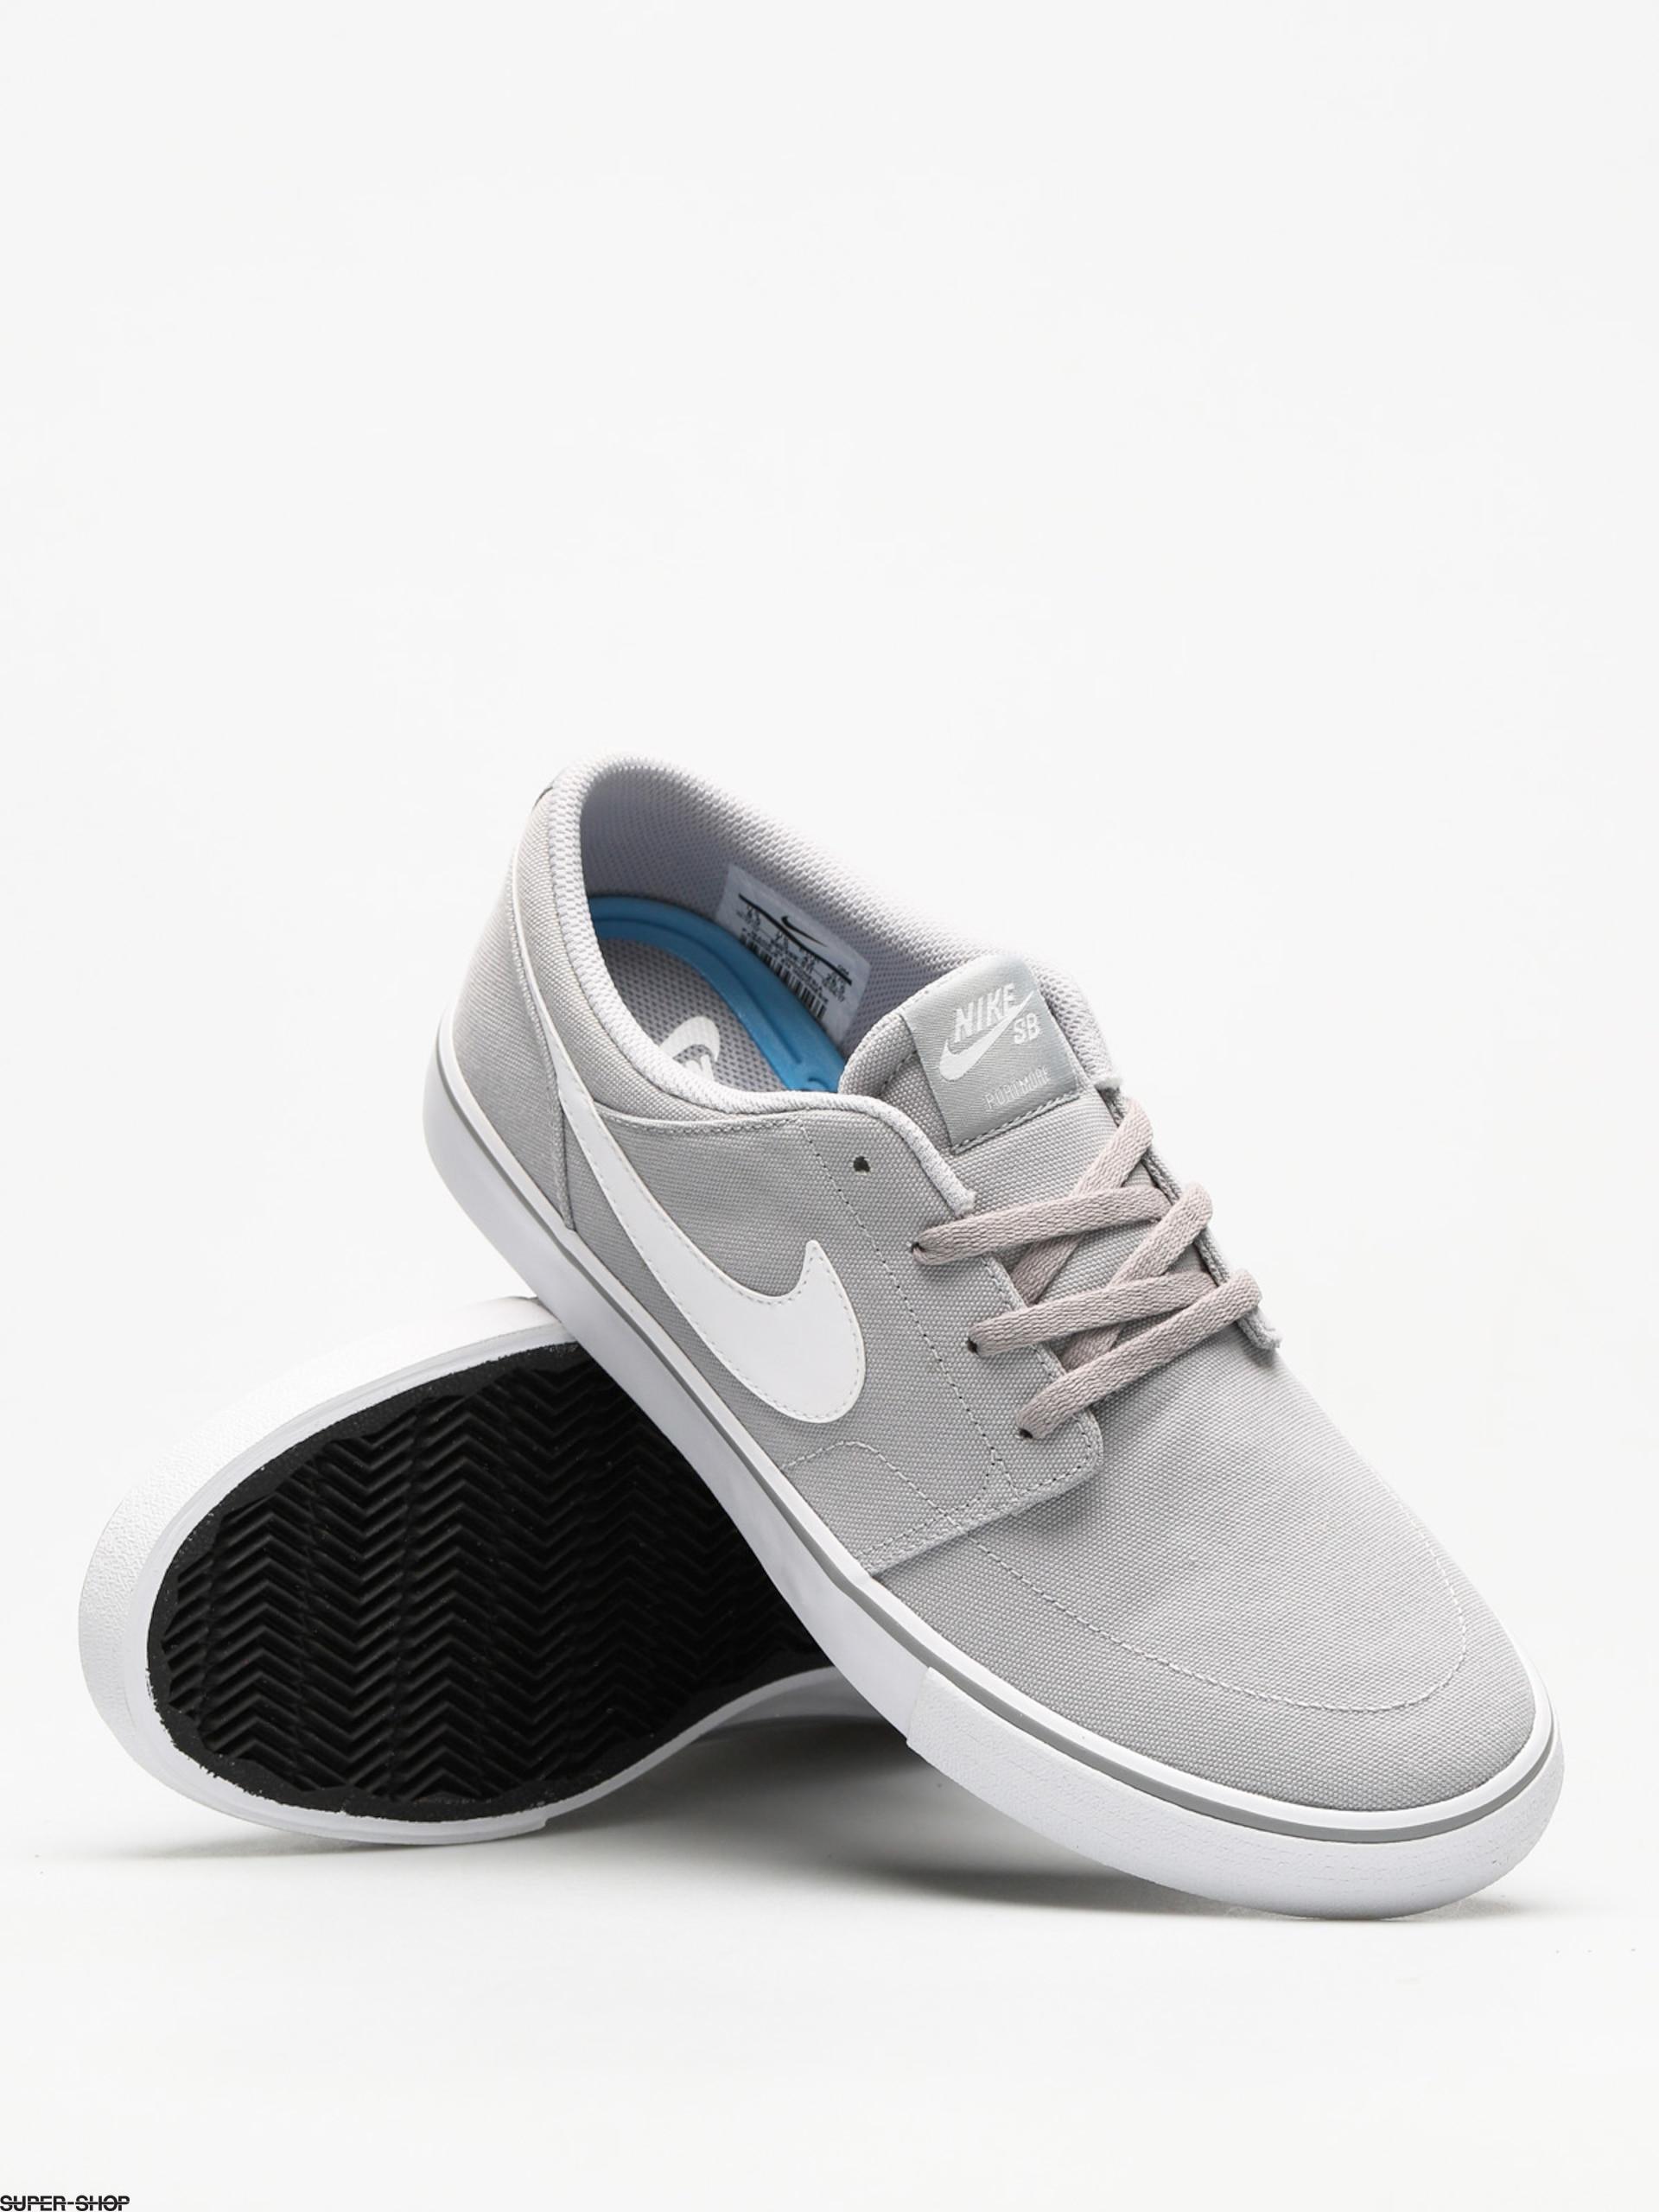 junto a Superar Economía  Nike SB Shoes Sb Solarsoft Portmore II Canvas (wolf grey/white black)